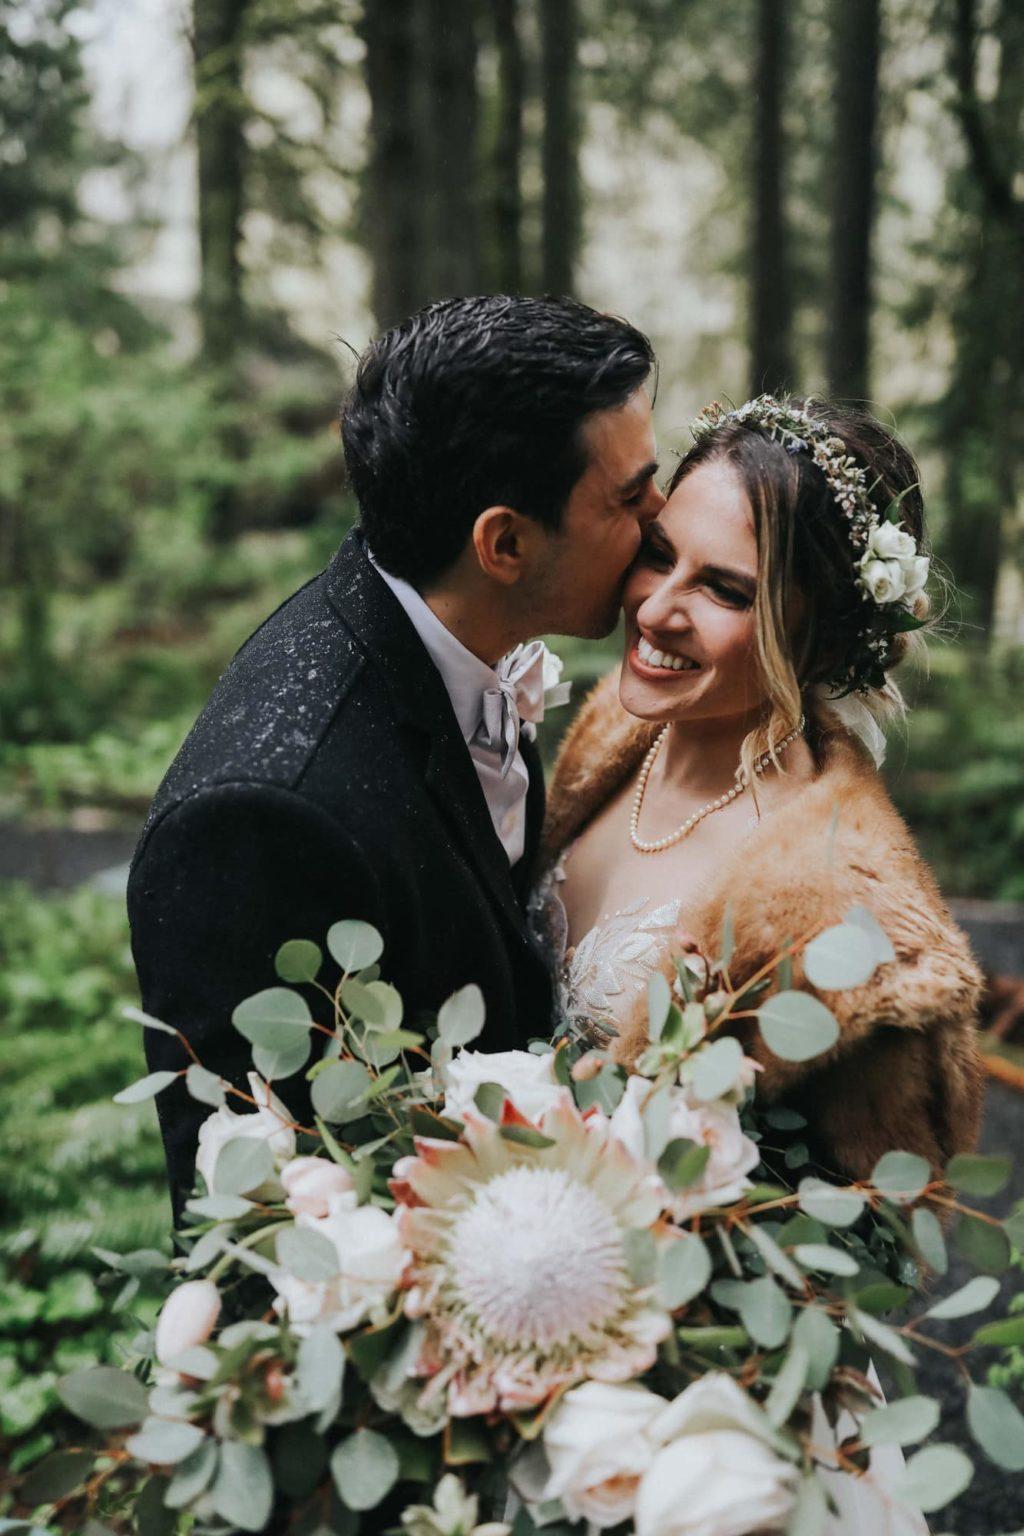 groom kissing bride's cheek while bride laughs